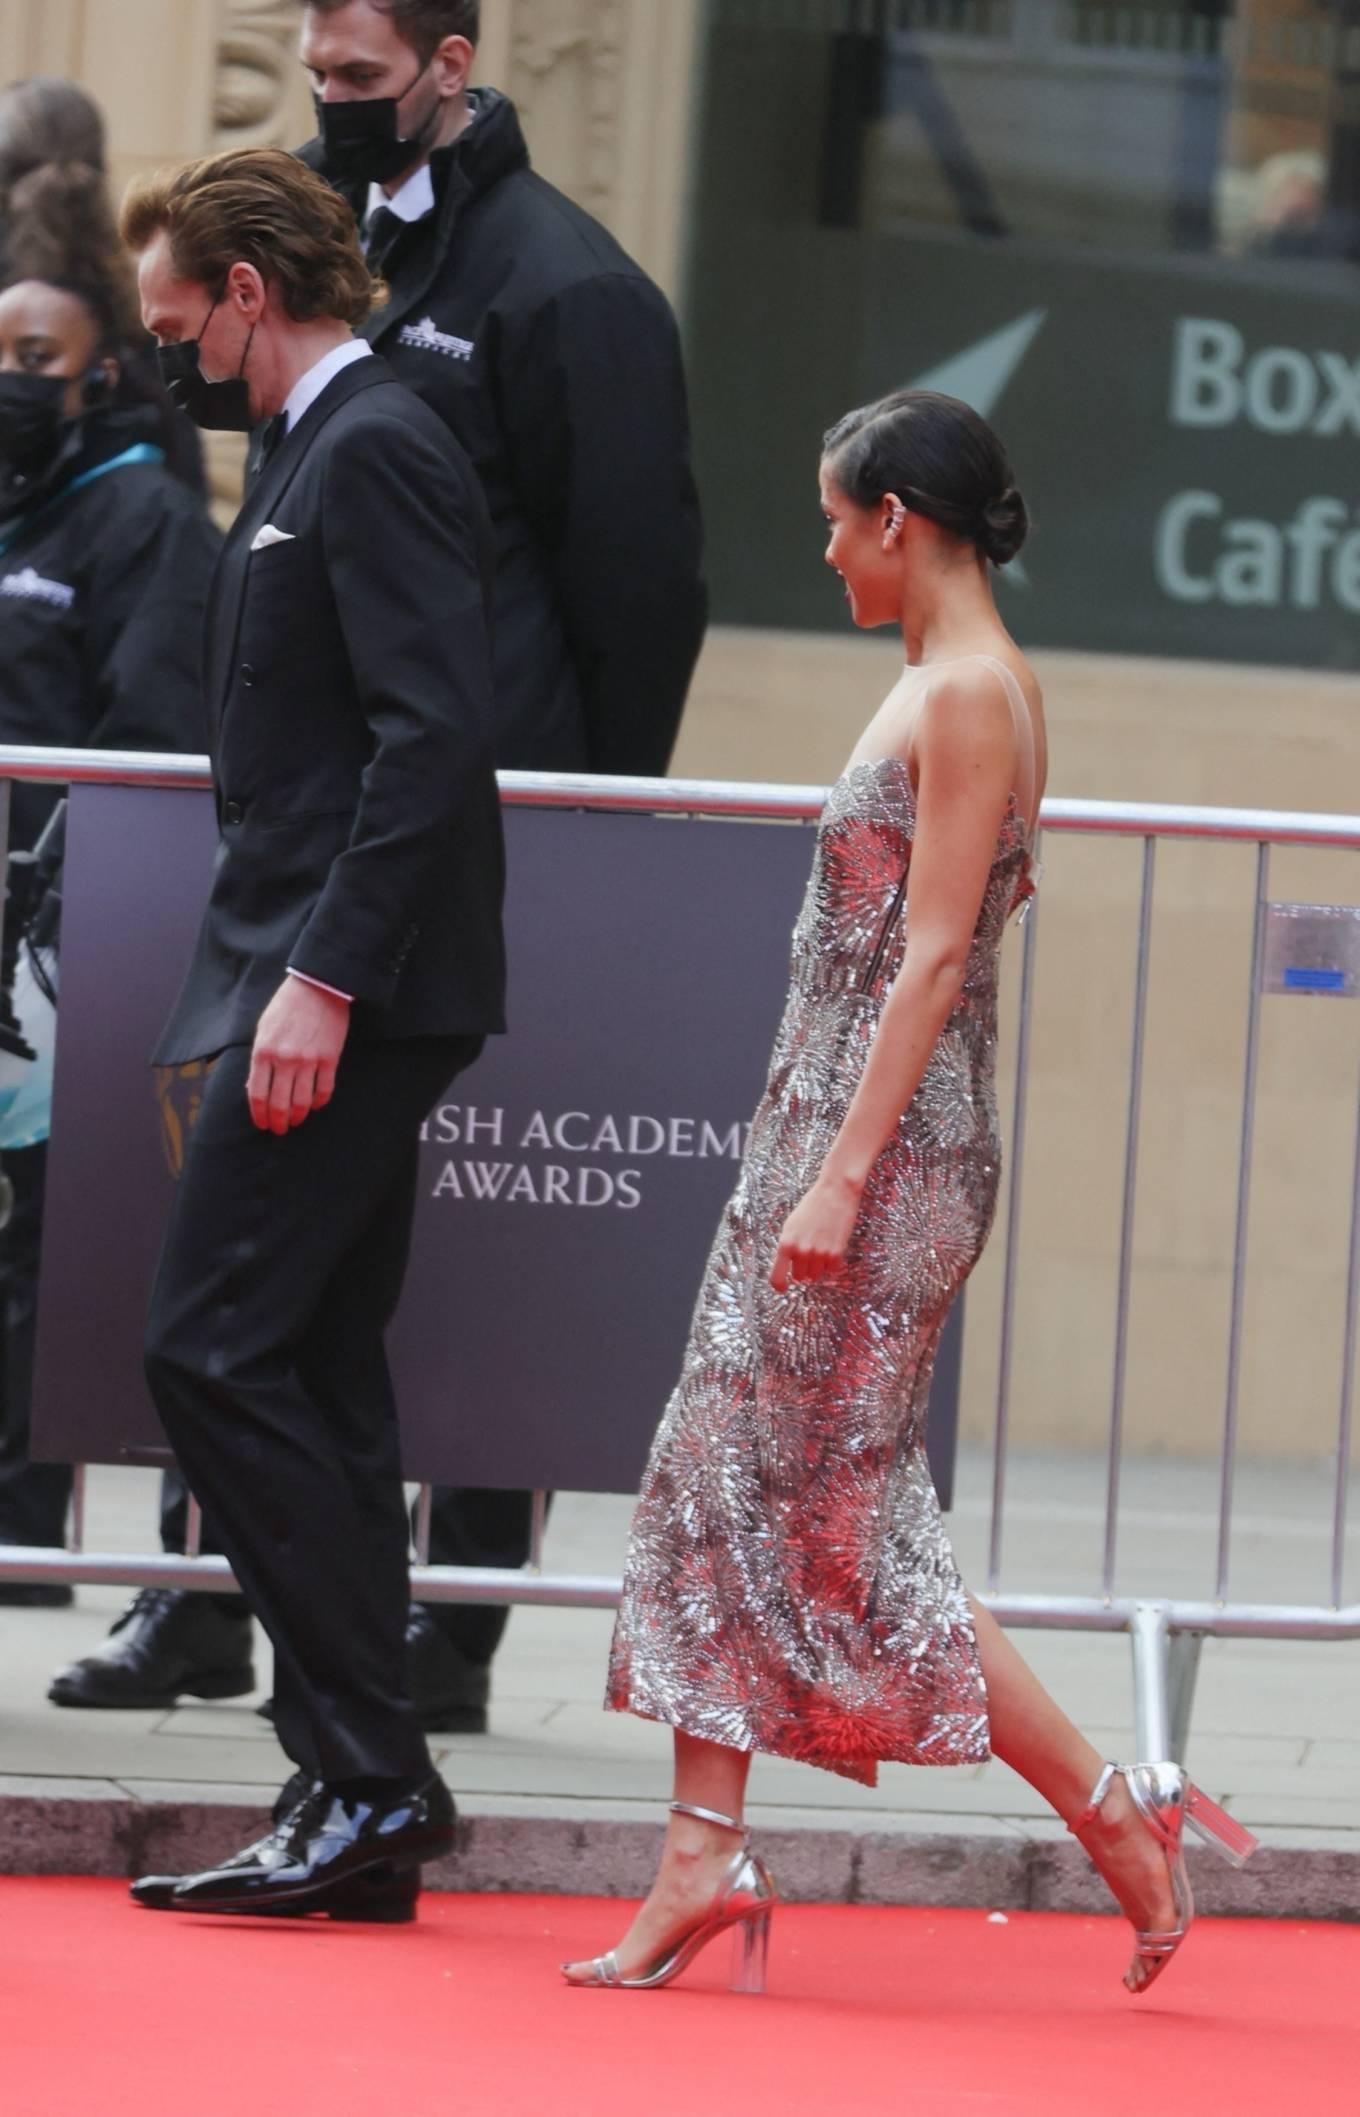 Gugu Mbath 2021 : Gugu Mbatha-Raw – at the Royal Albert Hall for 2021 British Academy Film Awards in London-23